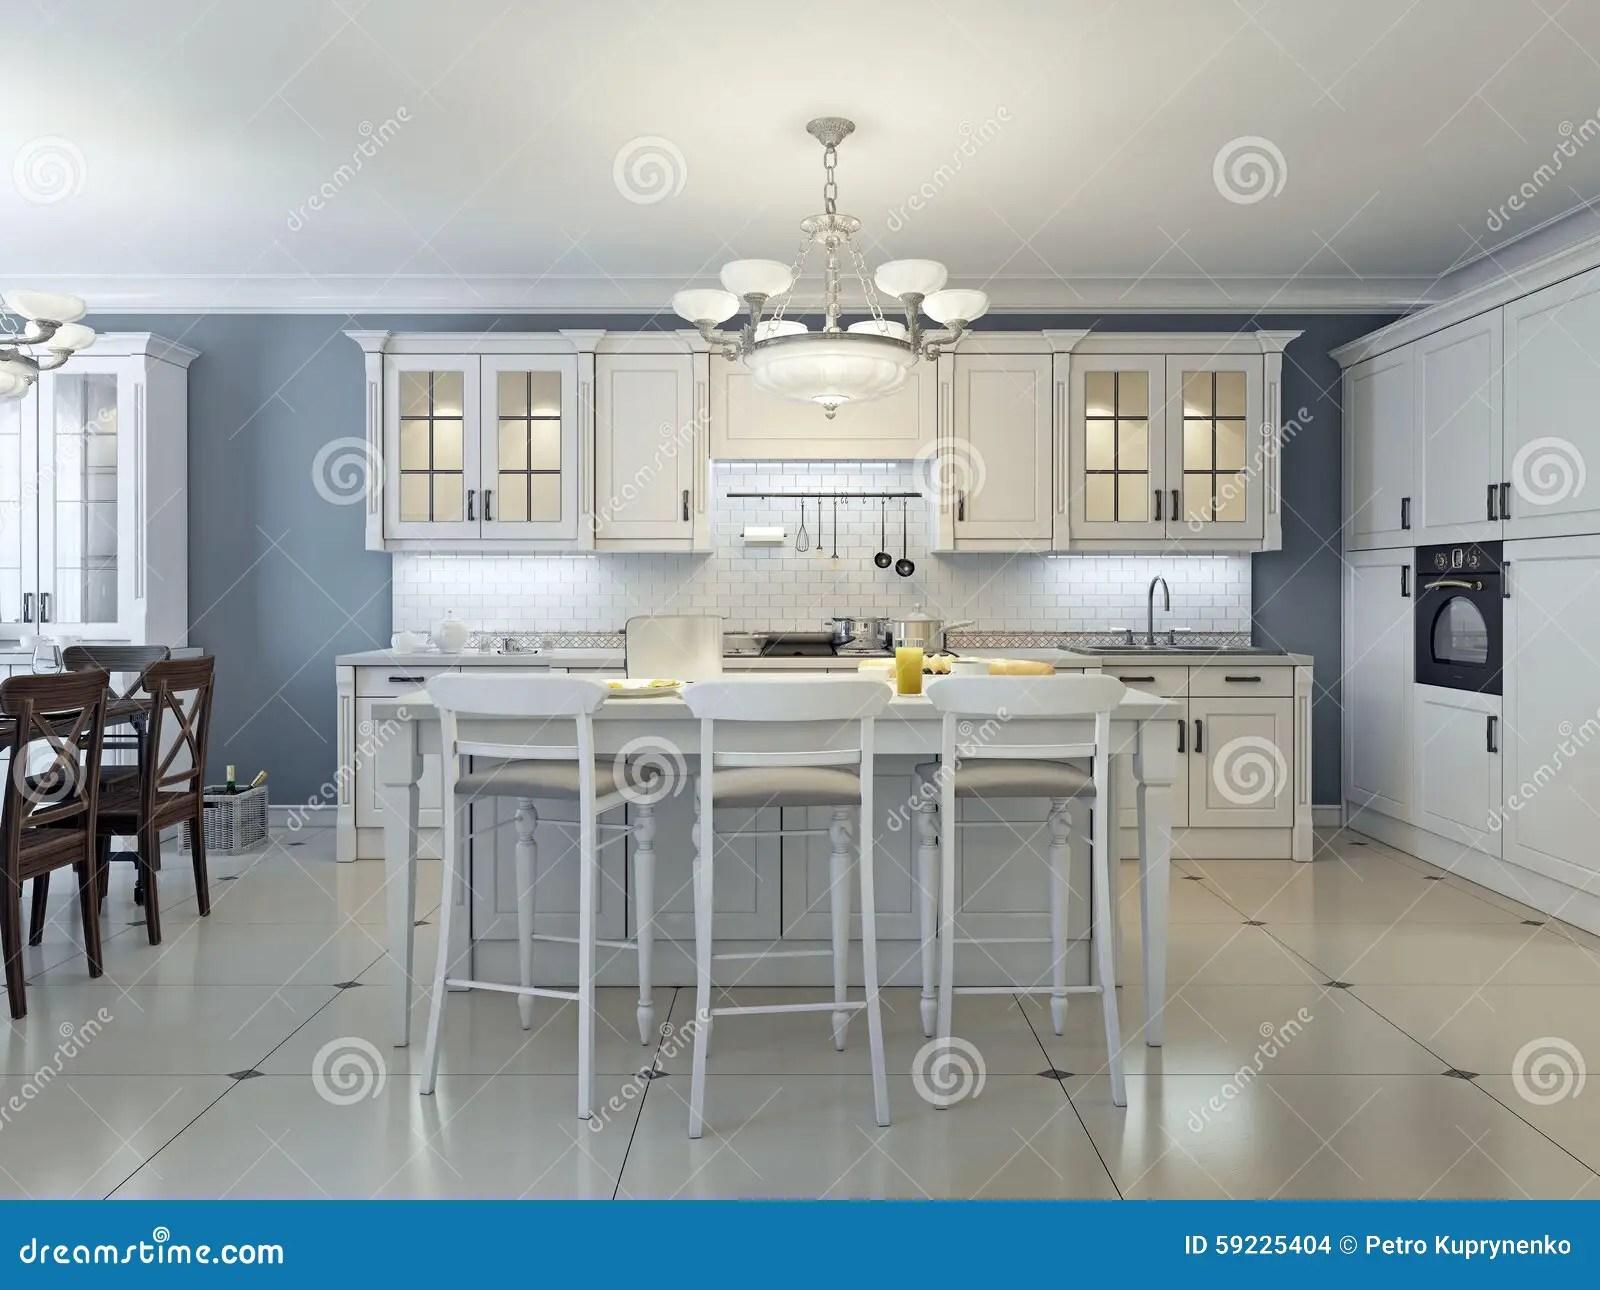 navy blue kitchen decor grey cabinet ideas 明亮的艺术装饰厨房设计库存例证 插画包括有地中海 蓝色 微波 枝形 明亮的艺术装饰厨房设计